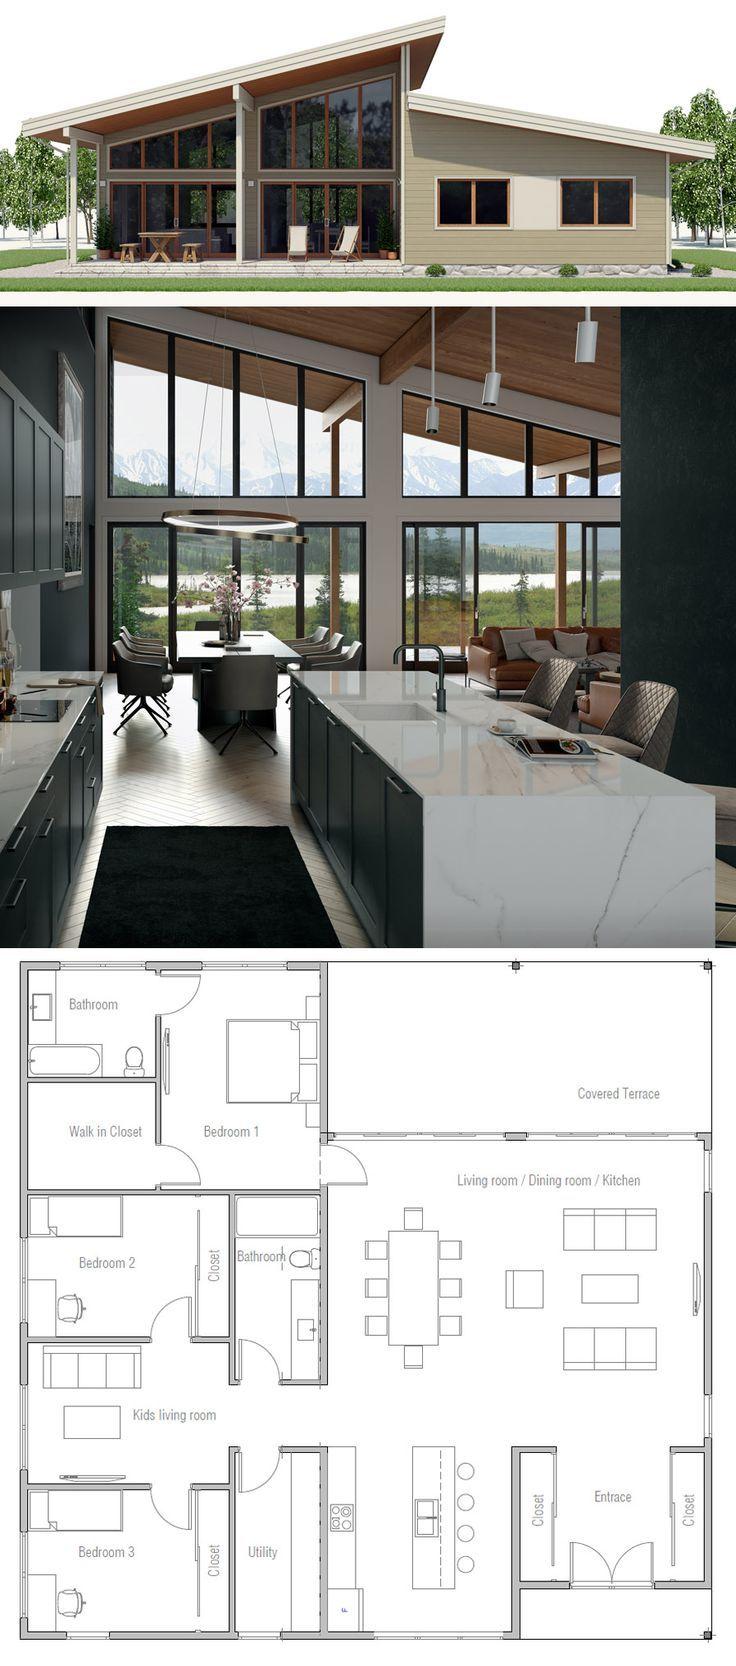 Hausplane Hausplane Hausdesigns Architektur Architektur Homedecor H Architektur Projekte Modern House Plans House Layouts Architecture House